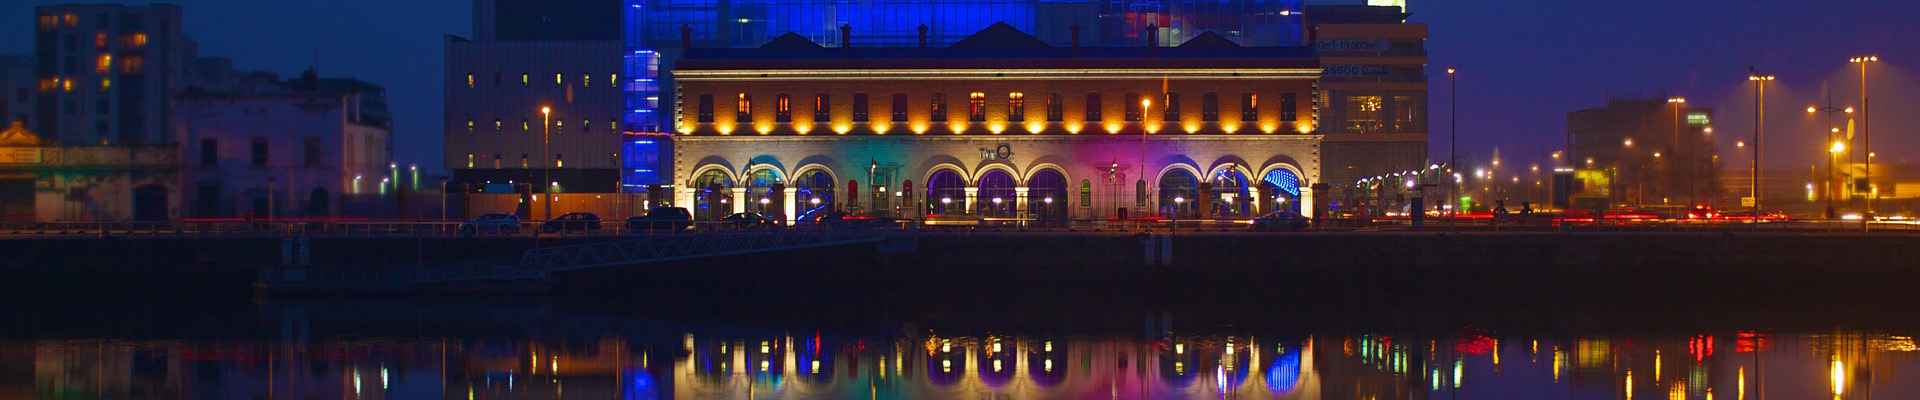 Dublin internship accommodation